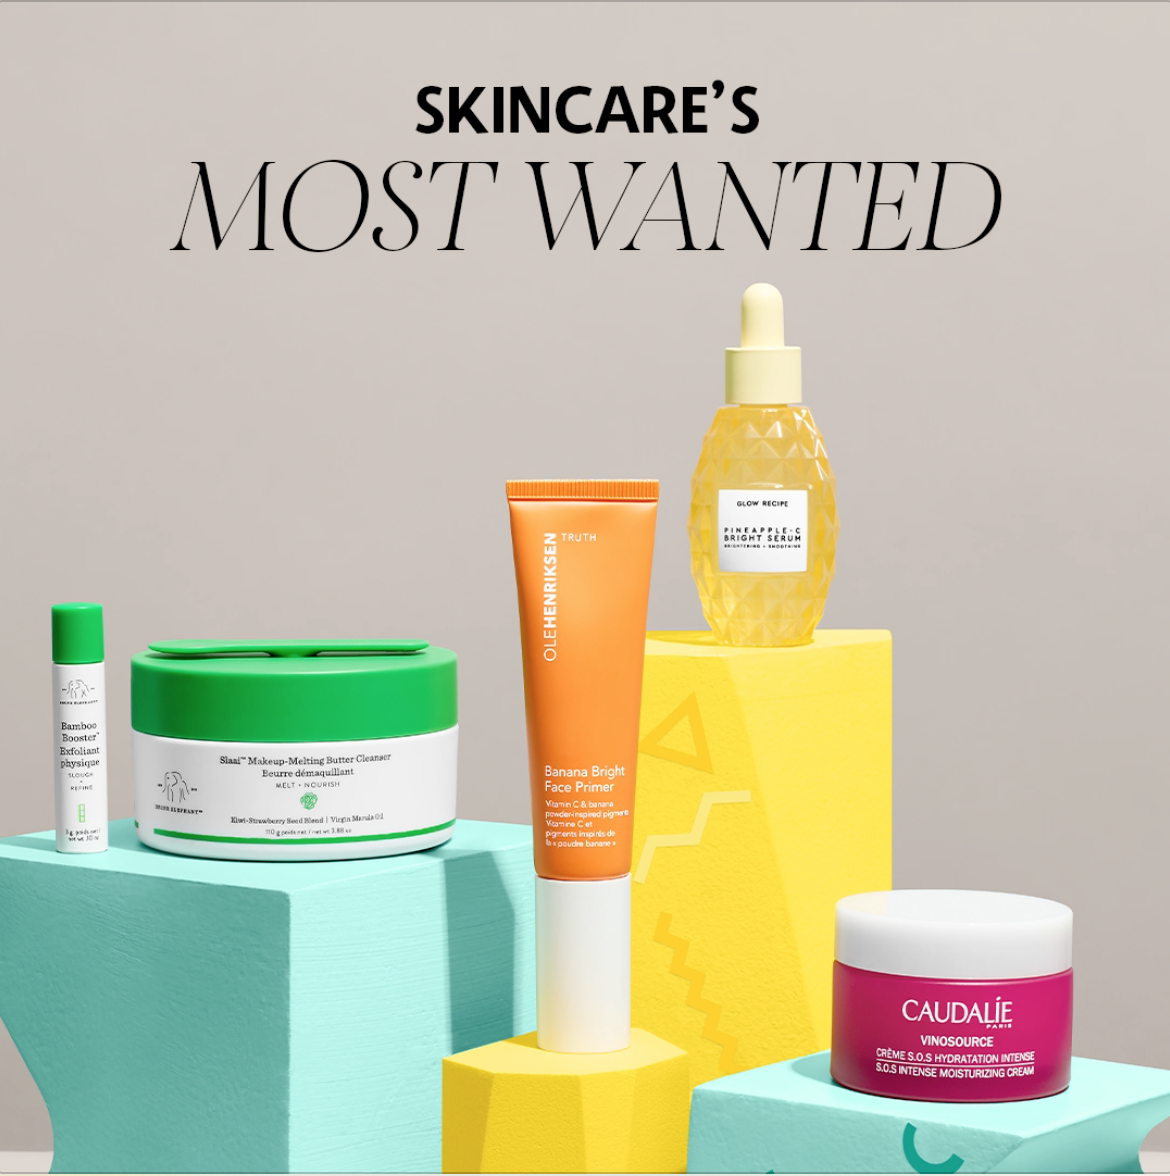 For every concern Makeup skin care, Skin care, Skin makeup